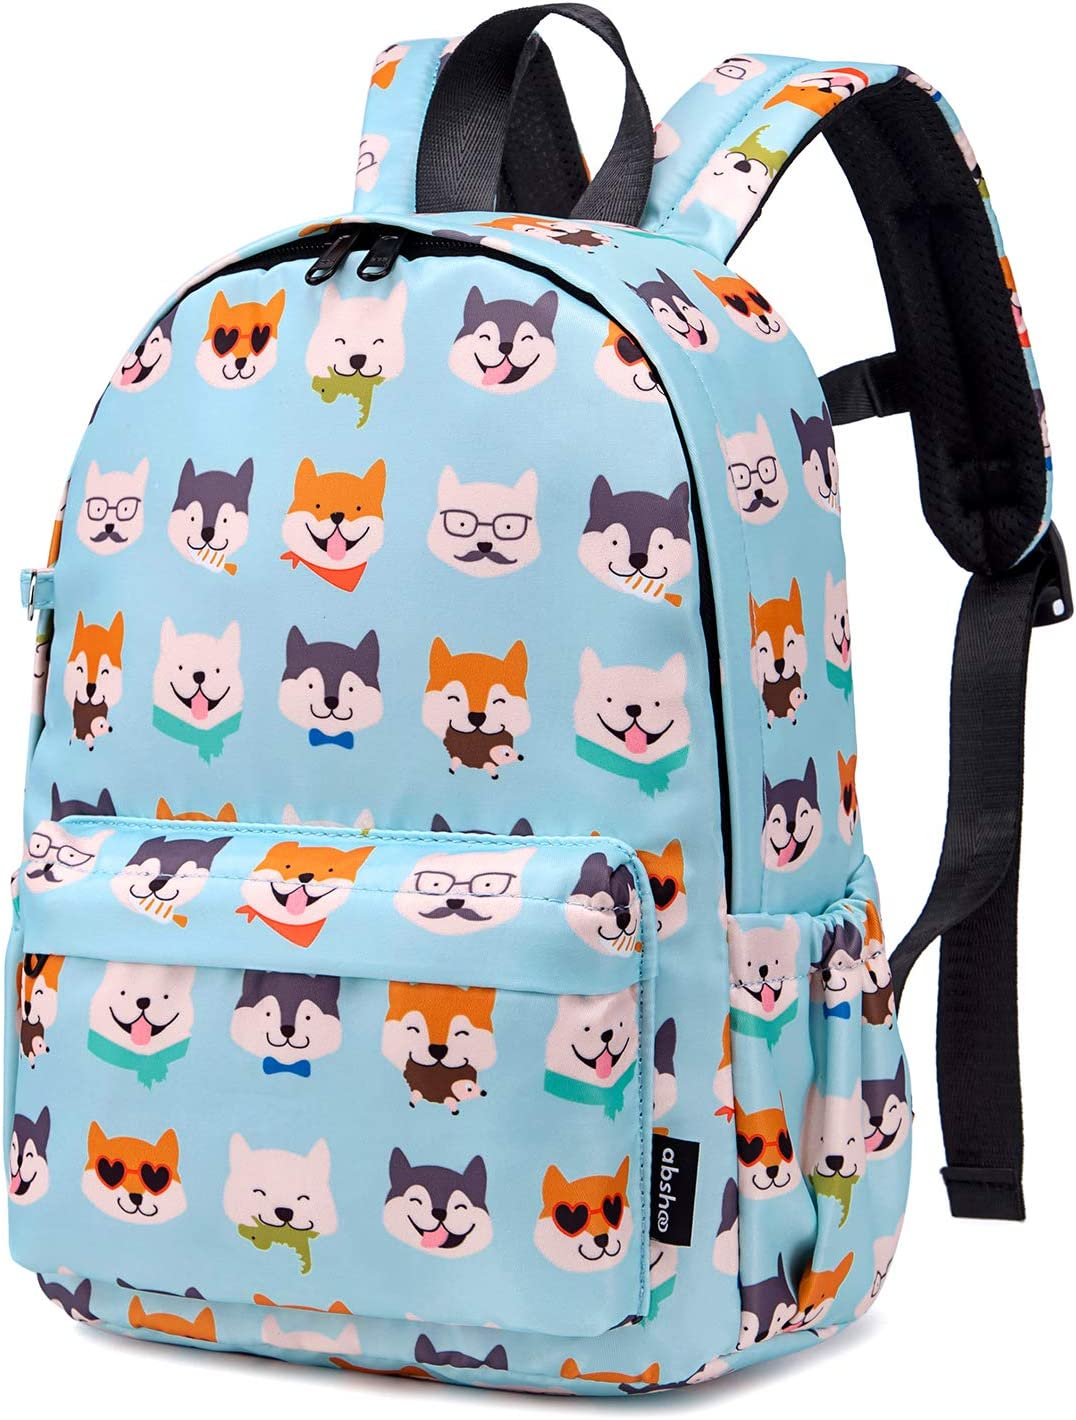 Husky Dog Teal Abshoo Little Kids Toddler Backpacks for Preschool Backpack With Chest Strap